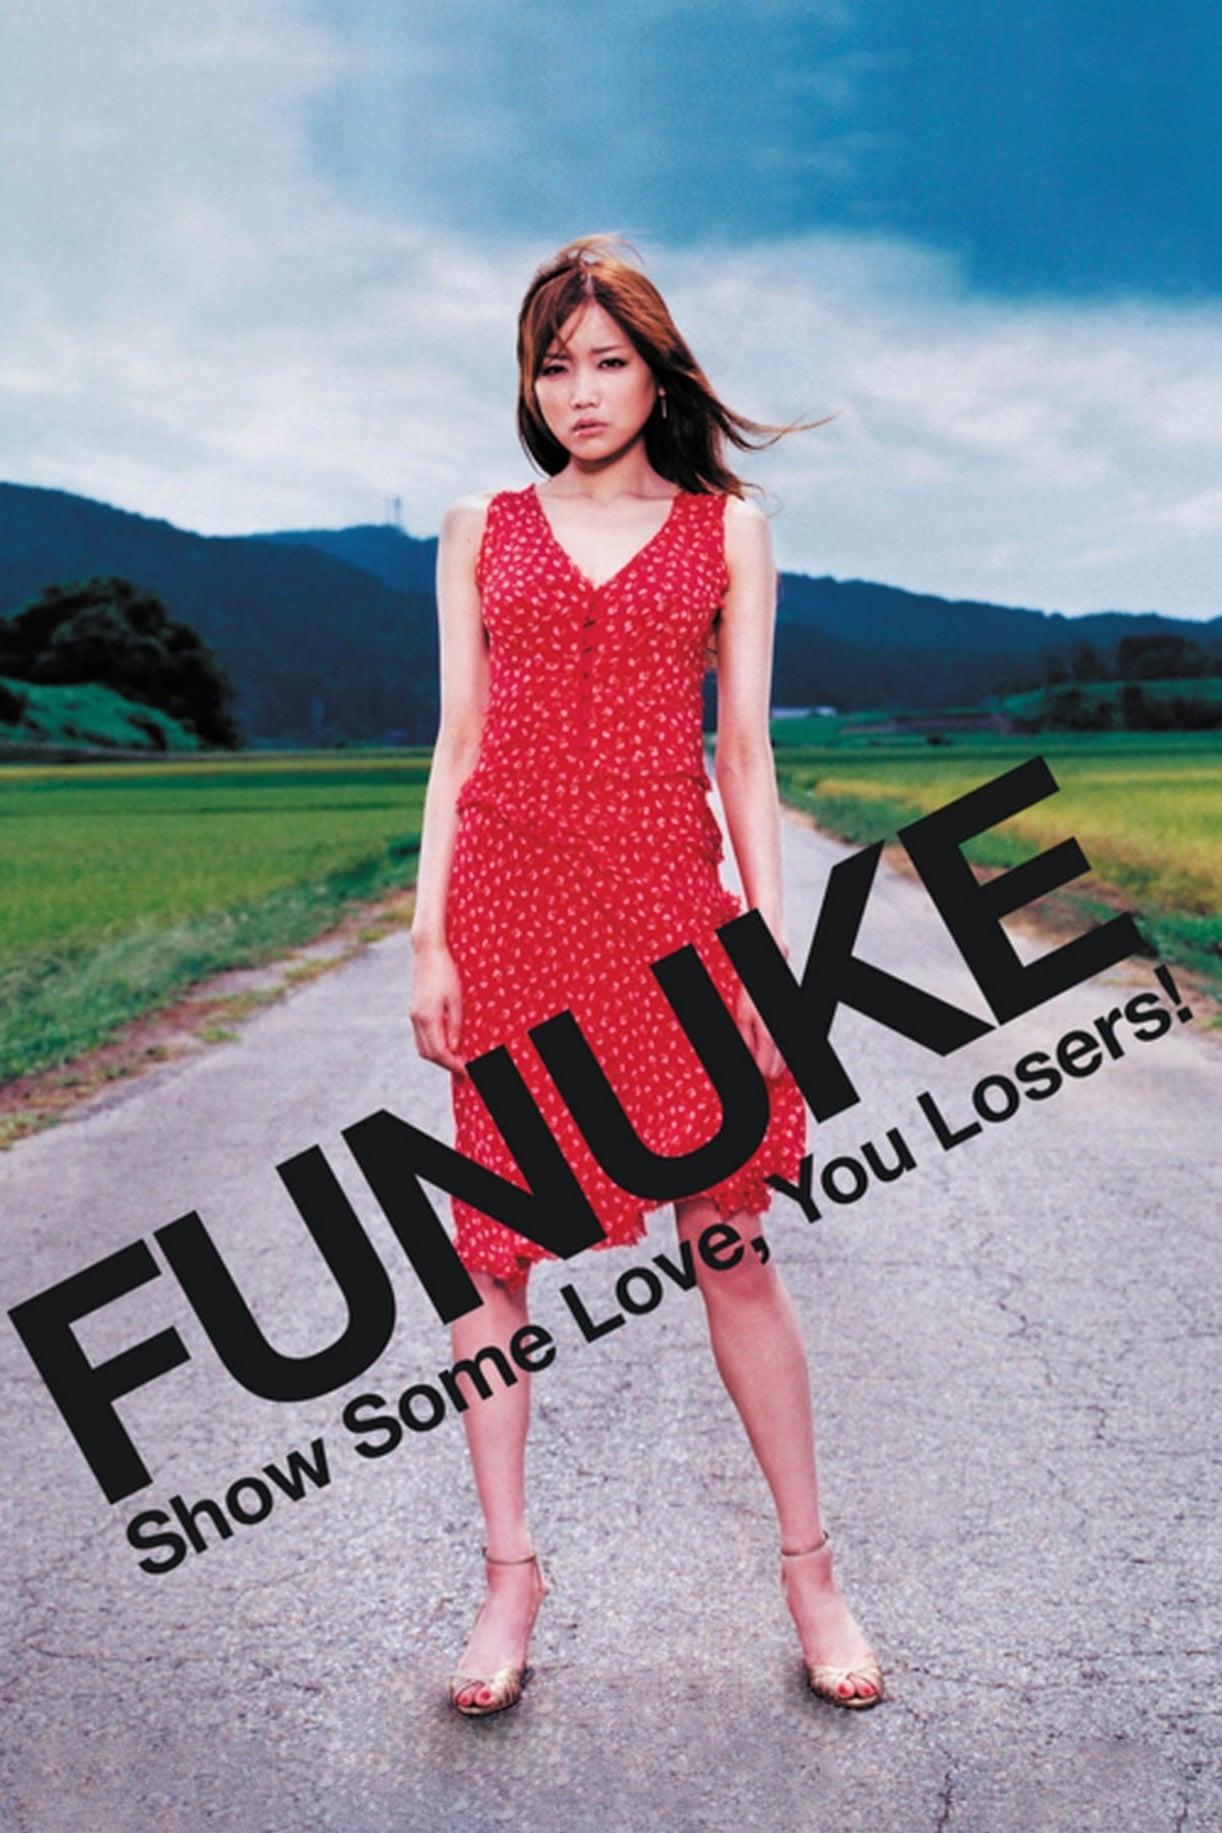 Funuke Show Some Love, You Losers!